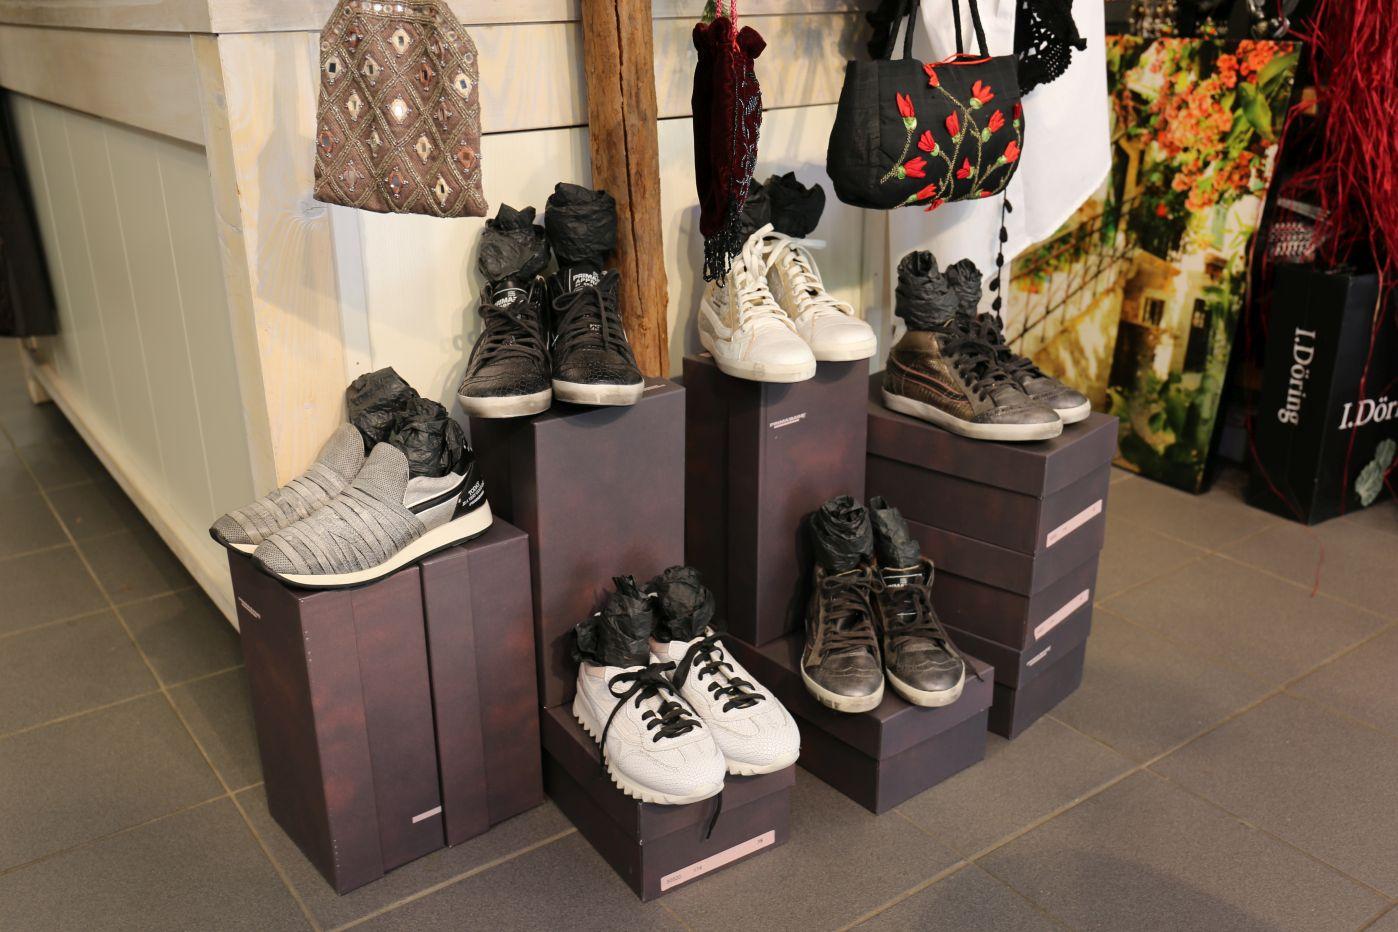 Doering boutique(7)